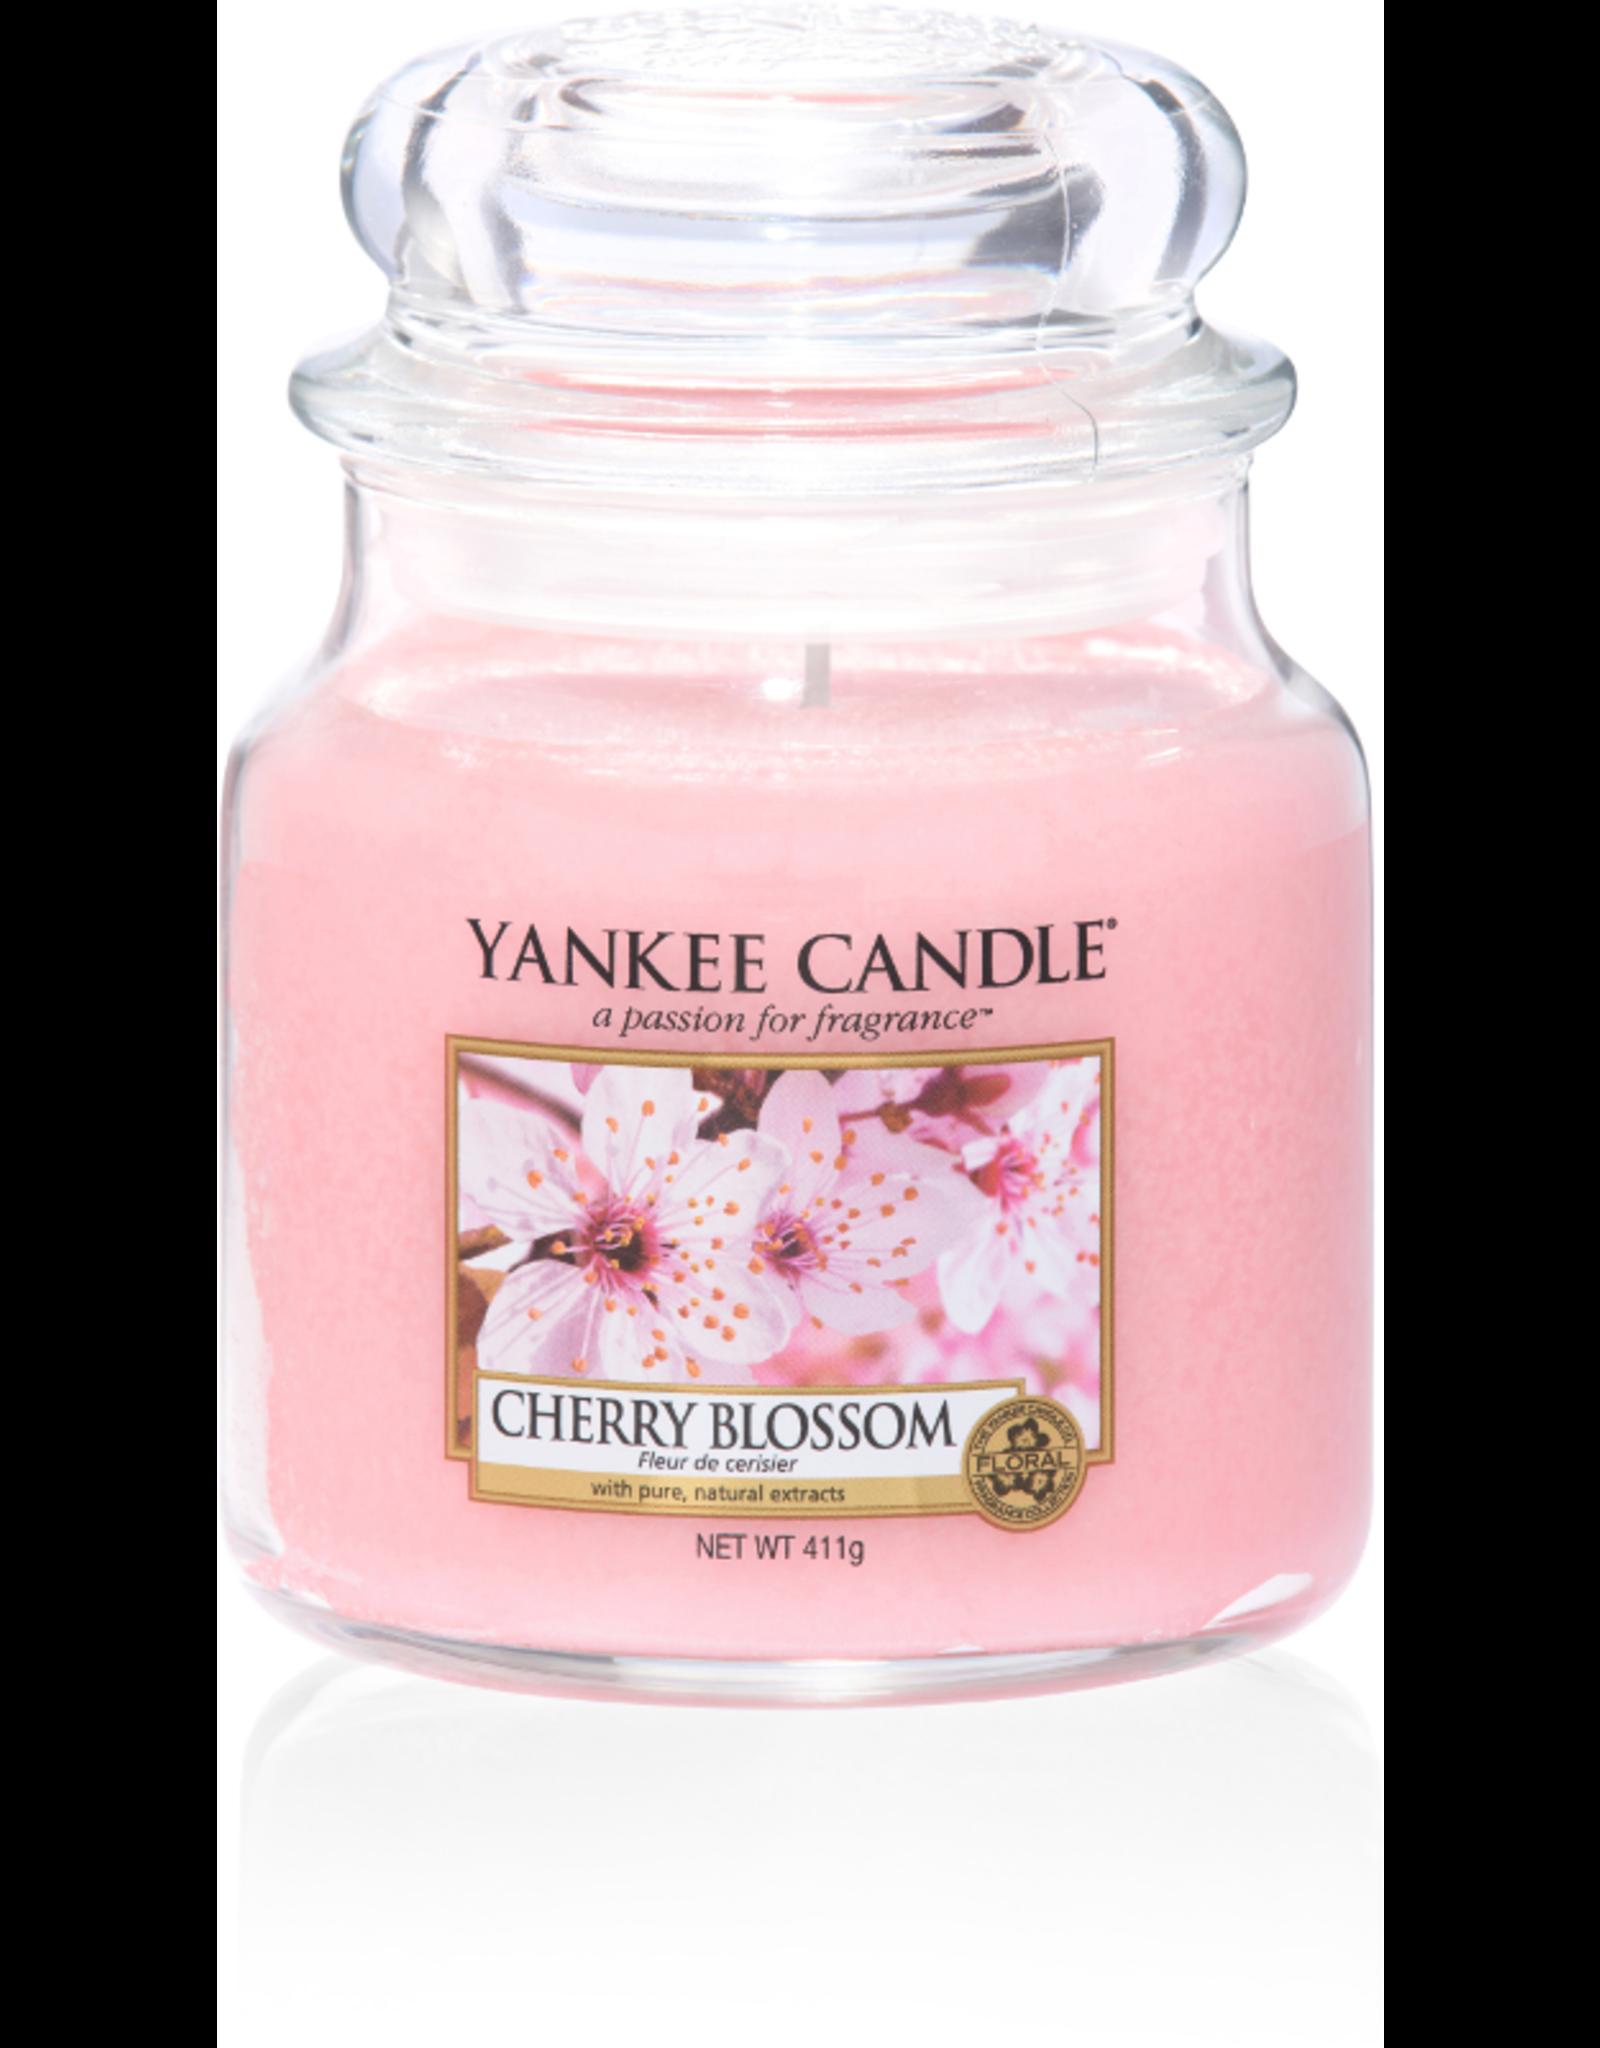 Yankee Candle Cherry Blossom Yankee Candle Medium